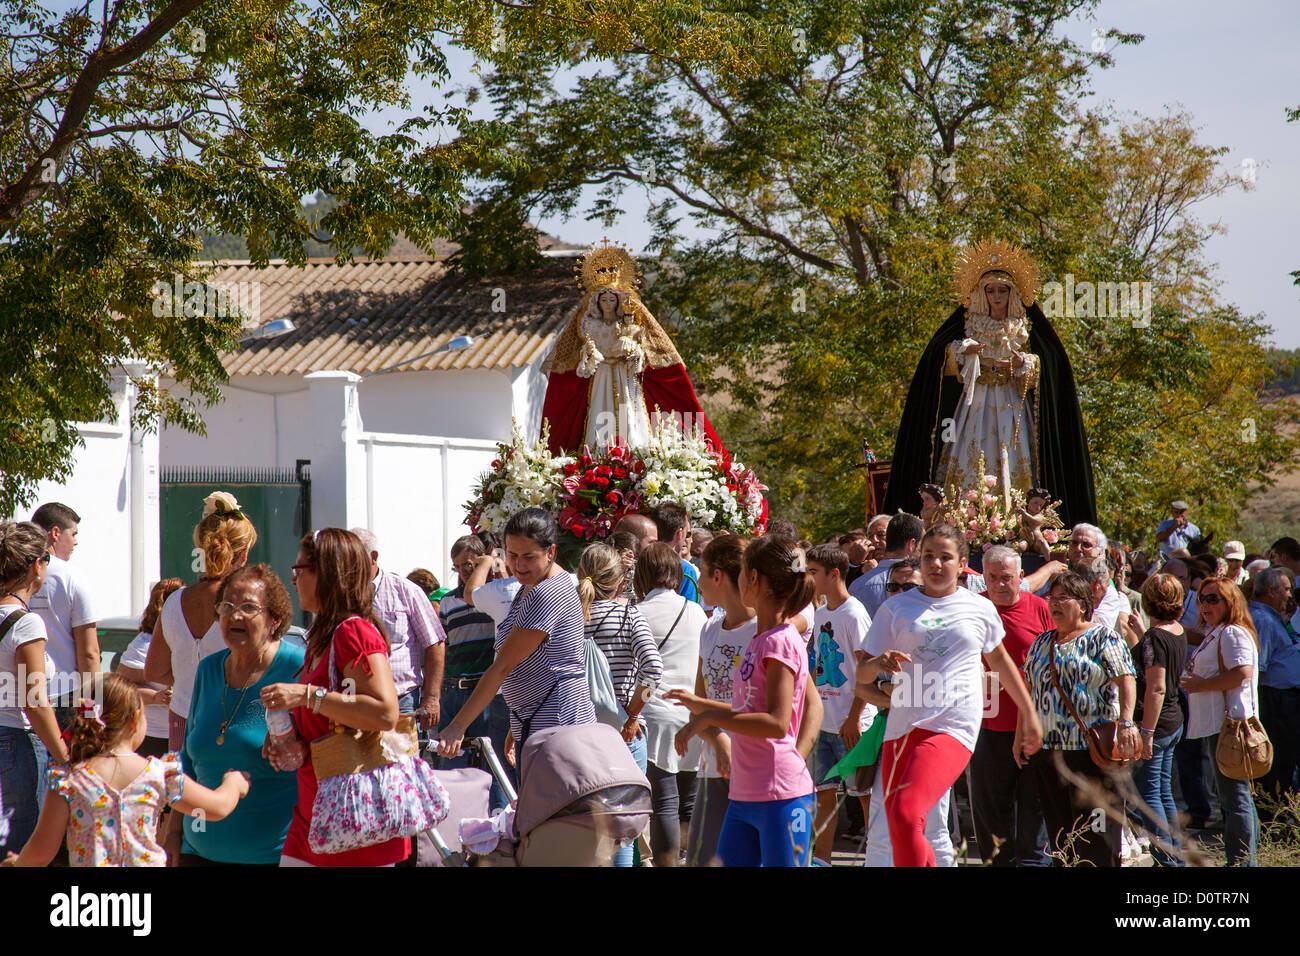 Traditional procession Virgen del Rosario in the village of Peñarrubia Malaga Andalusia Spain - Stock Image